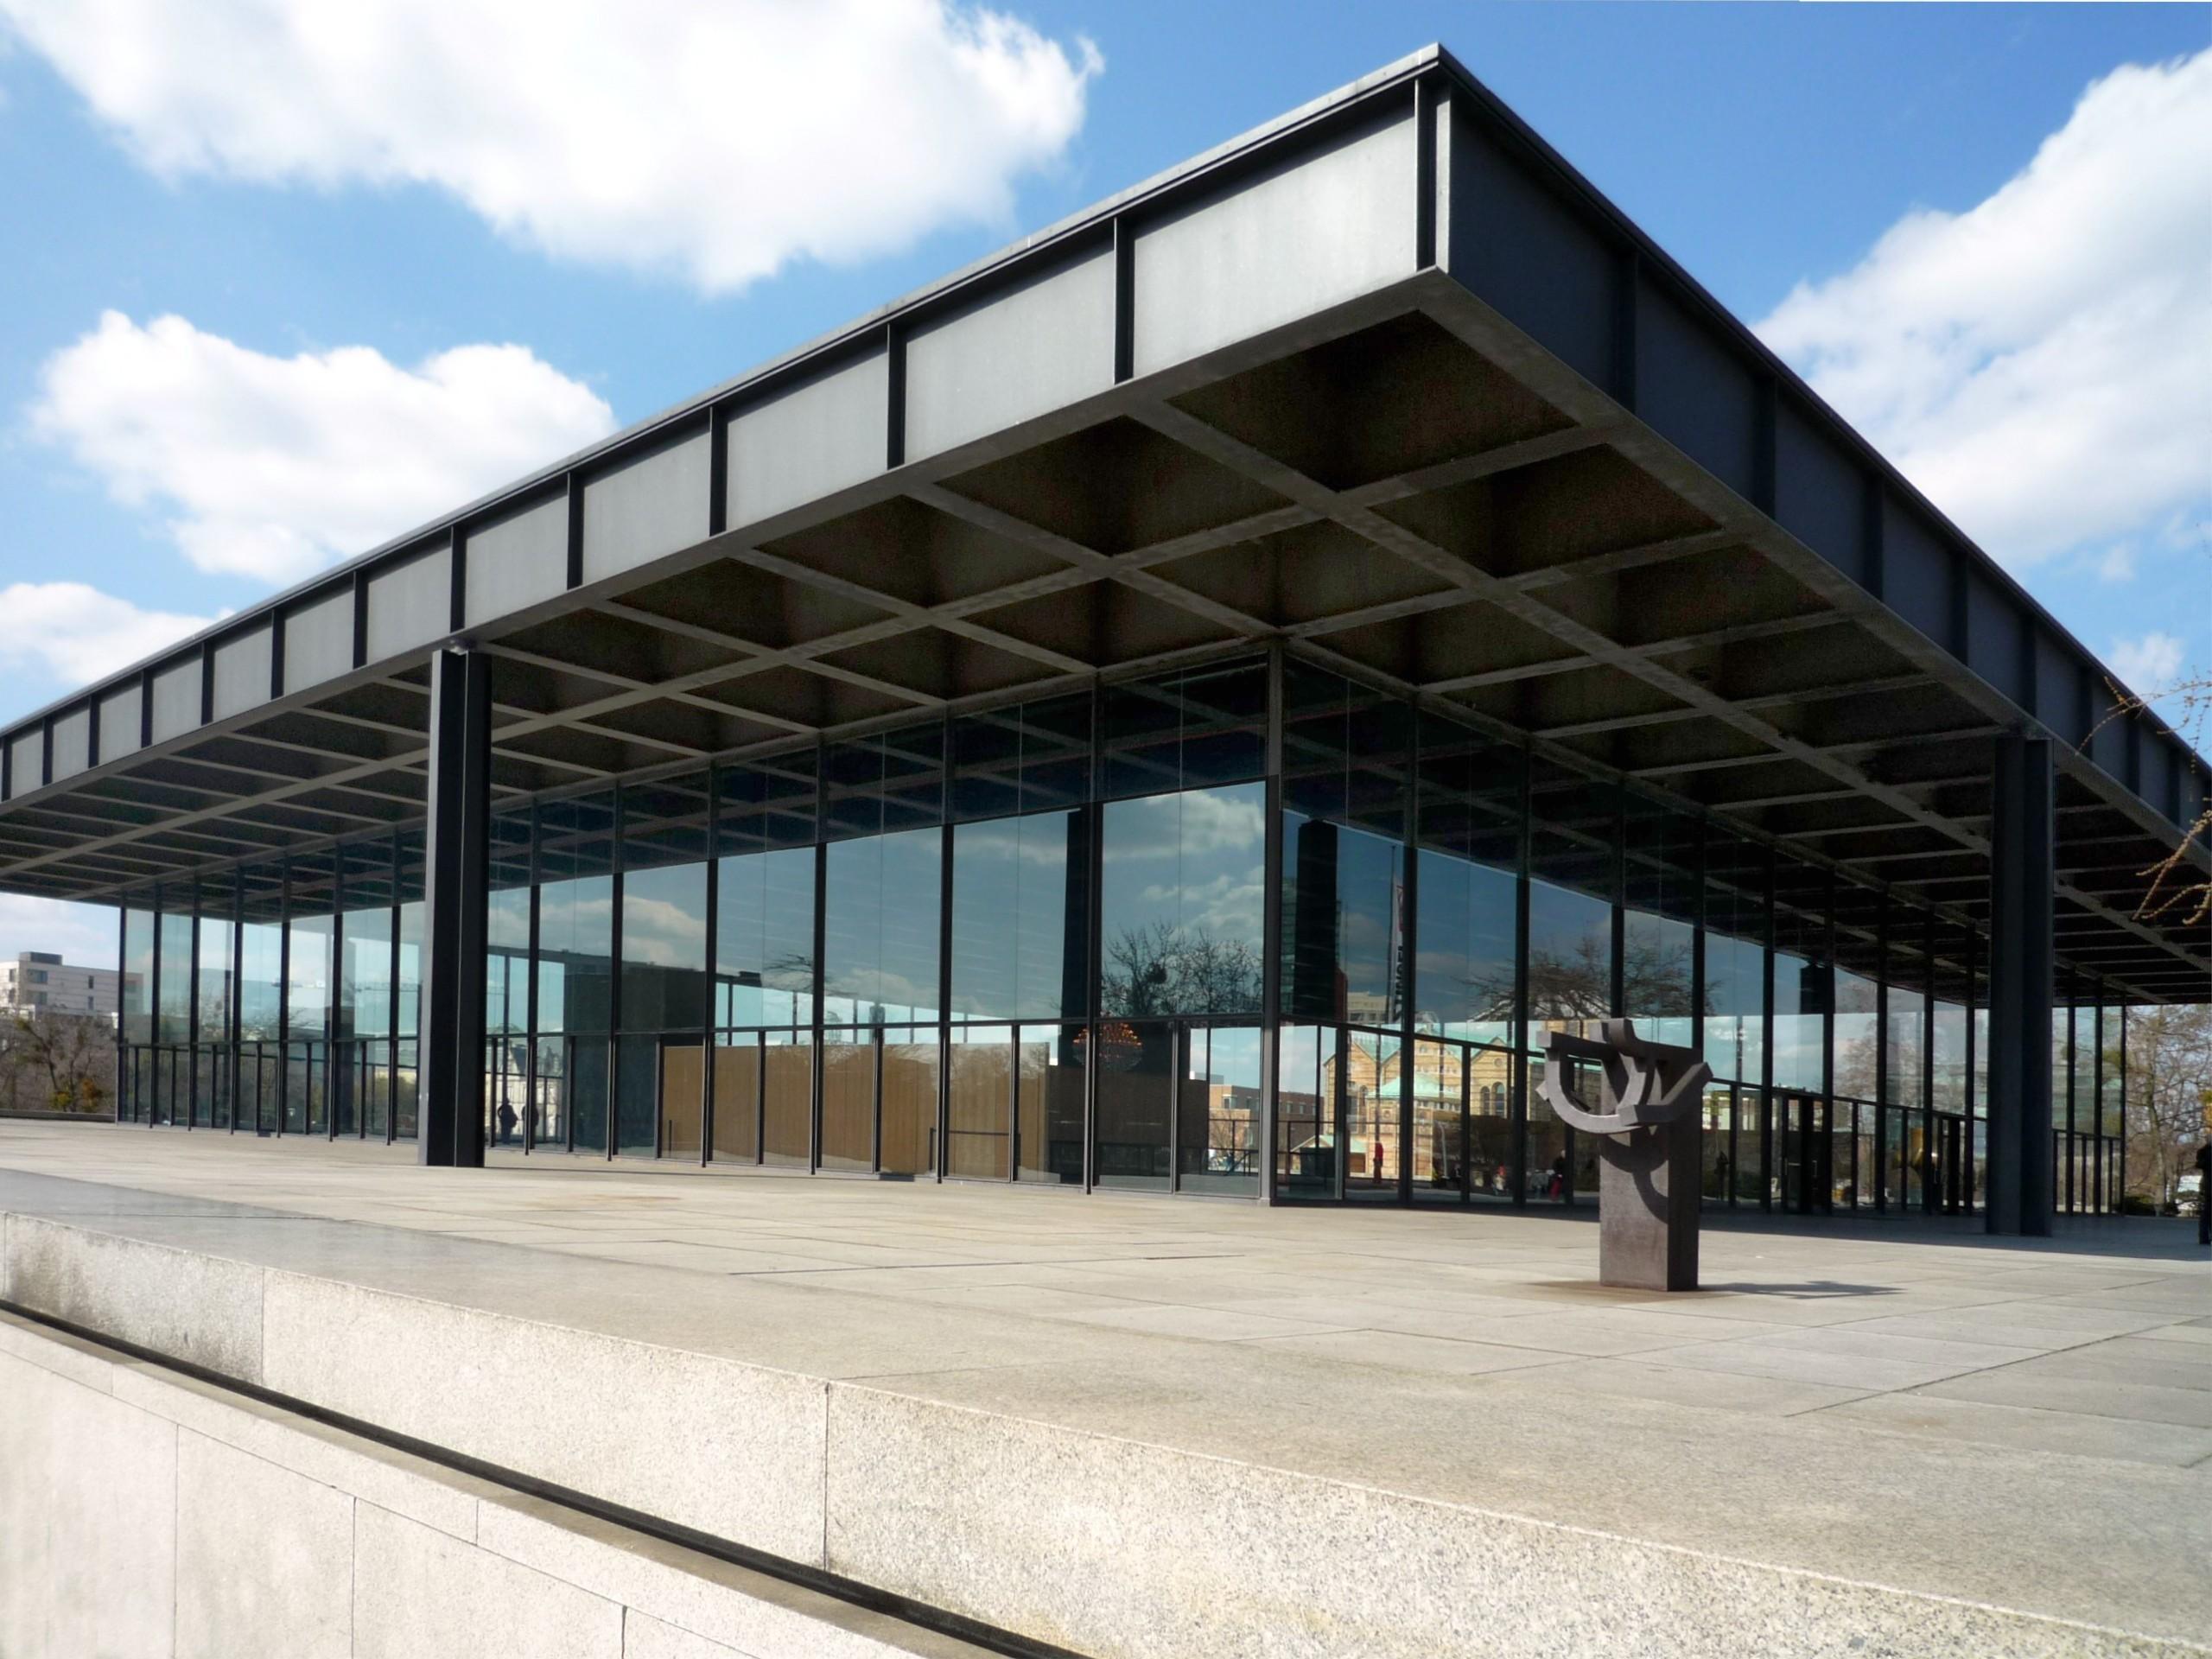 Consuelo Castiglioni Neue Nationalgalerie by Mies van der Rohe